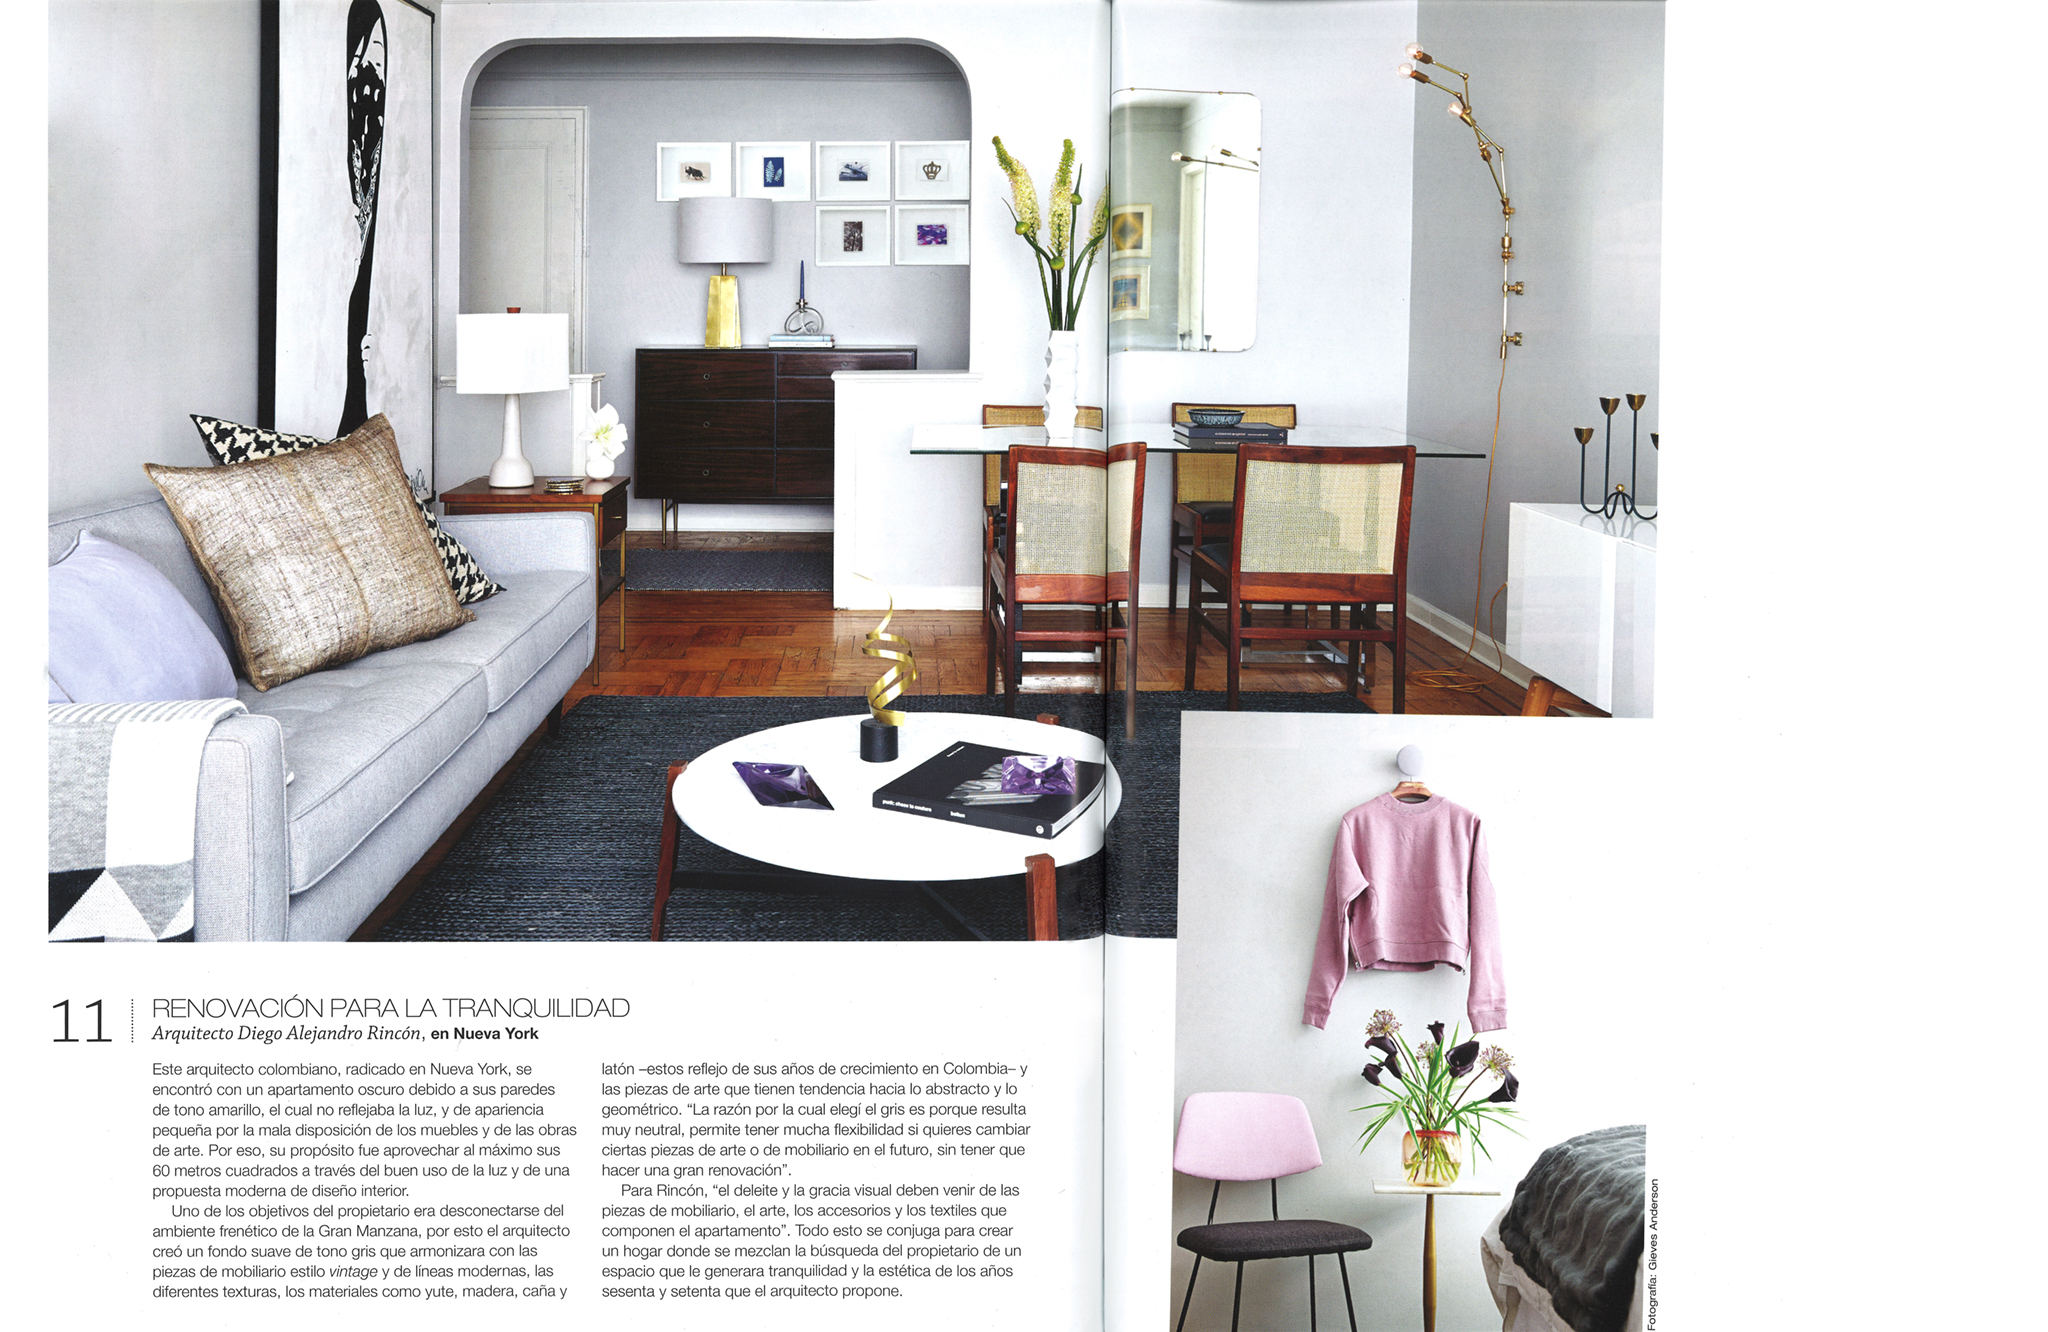 new-york-interior-designer-diego-alejandro-design-axxis-2